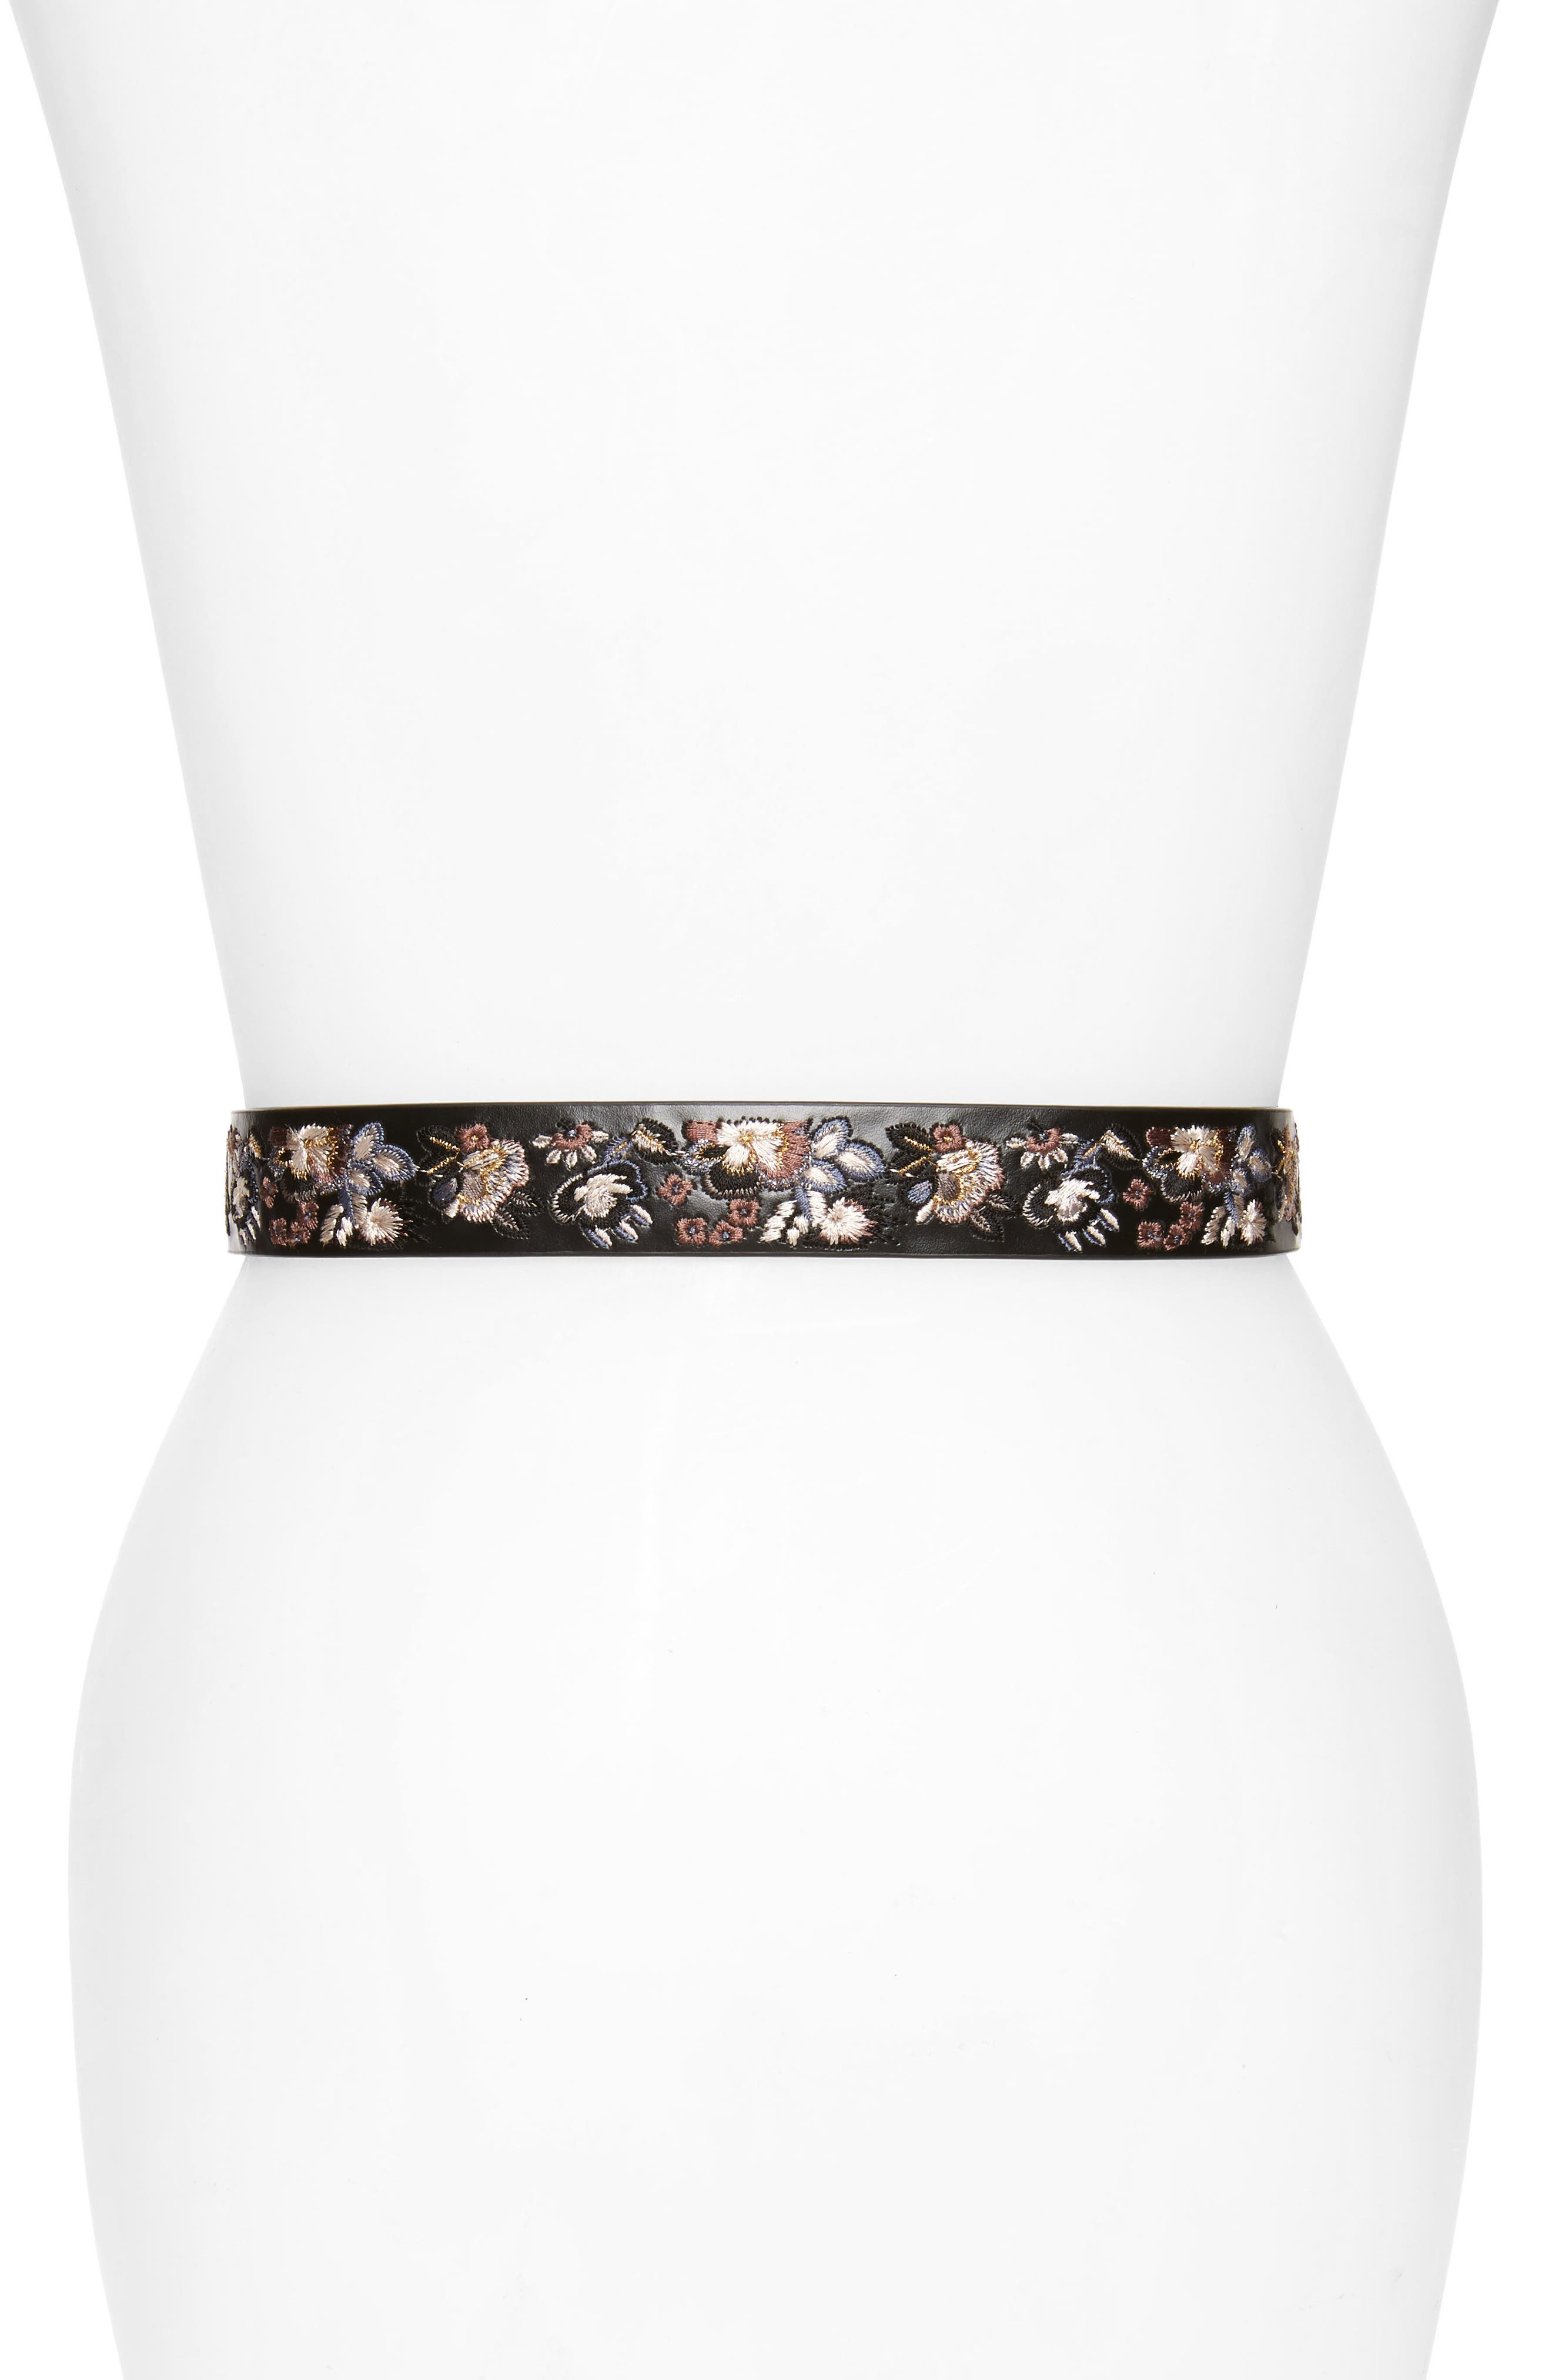 Embroidered Leather Belt,                             Alternate thumbnail 2, color,                             Black / Pol Nickel